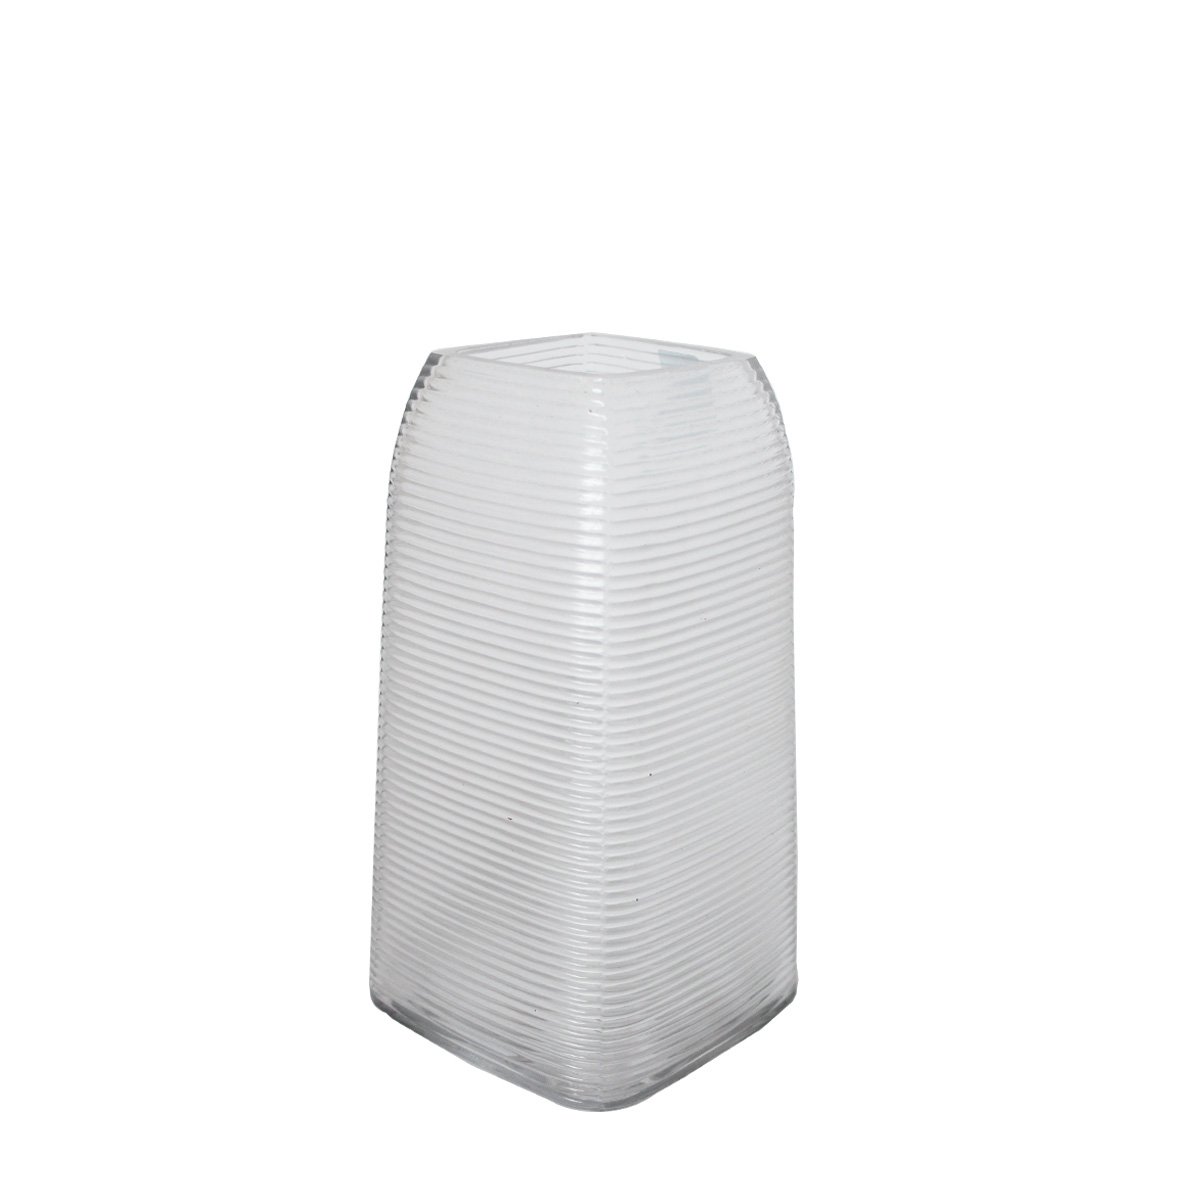 Vaza staklo Squre MUS-209